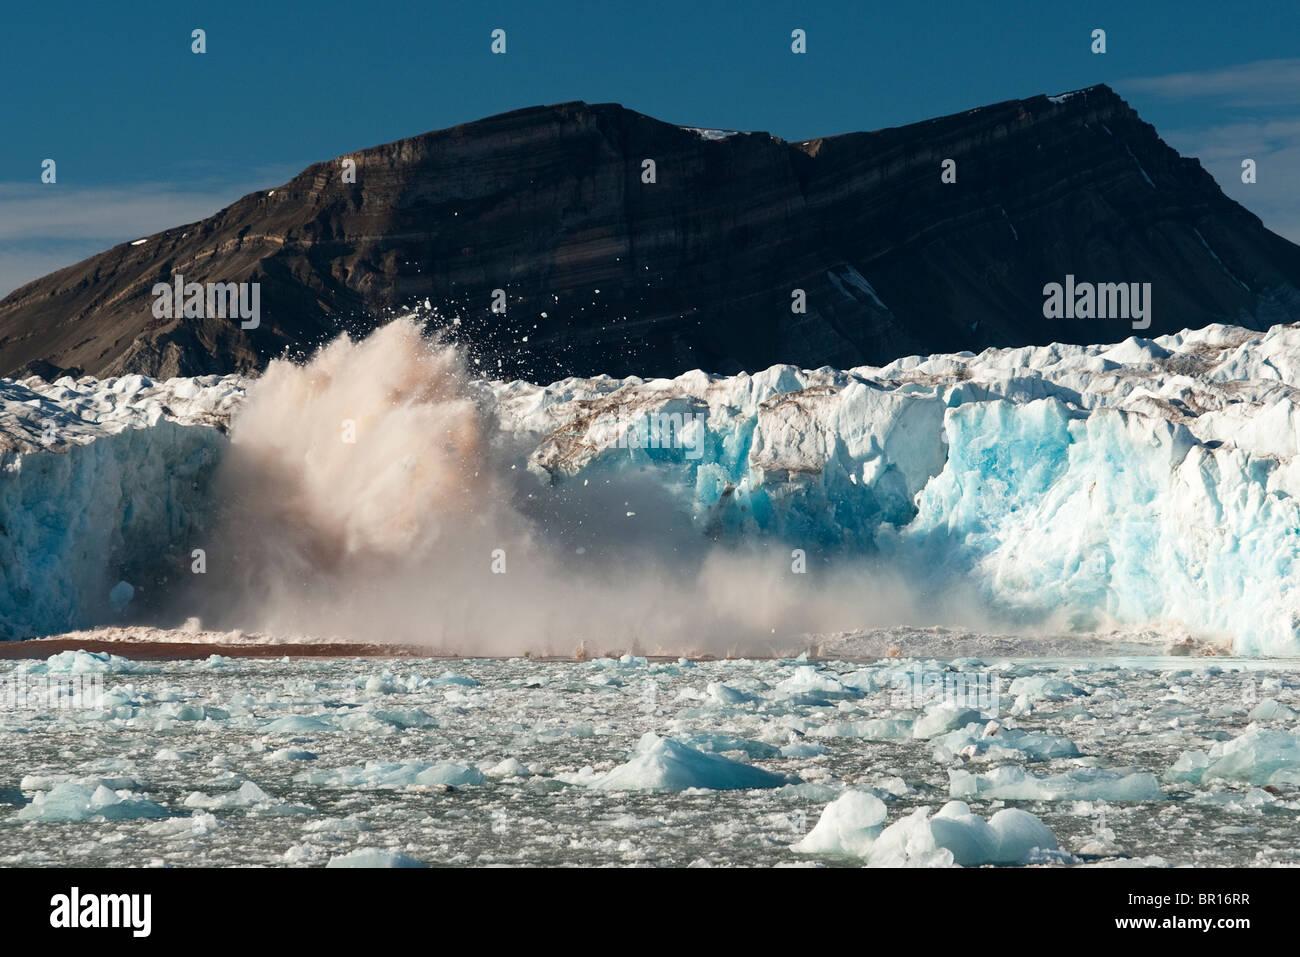 GLACIER CALVING ICE, SVALBARD, ARCTIC - Stock Image